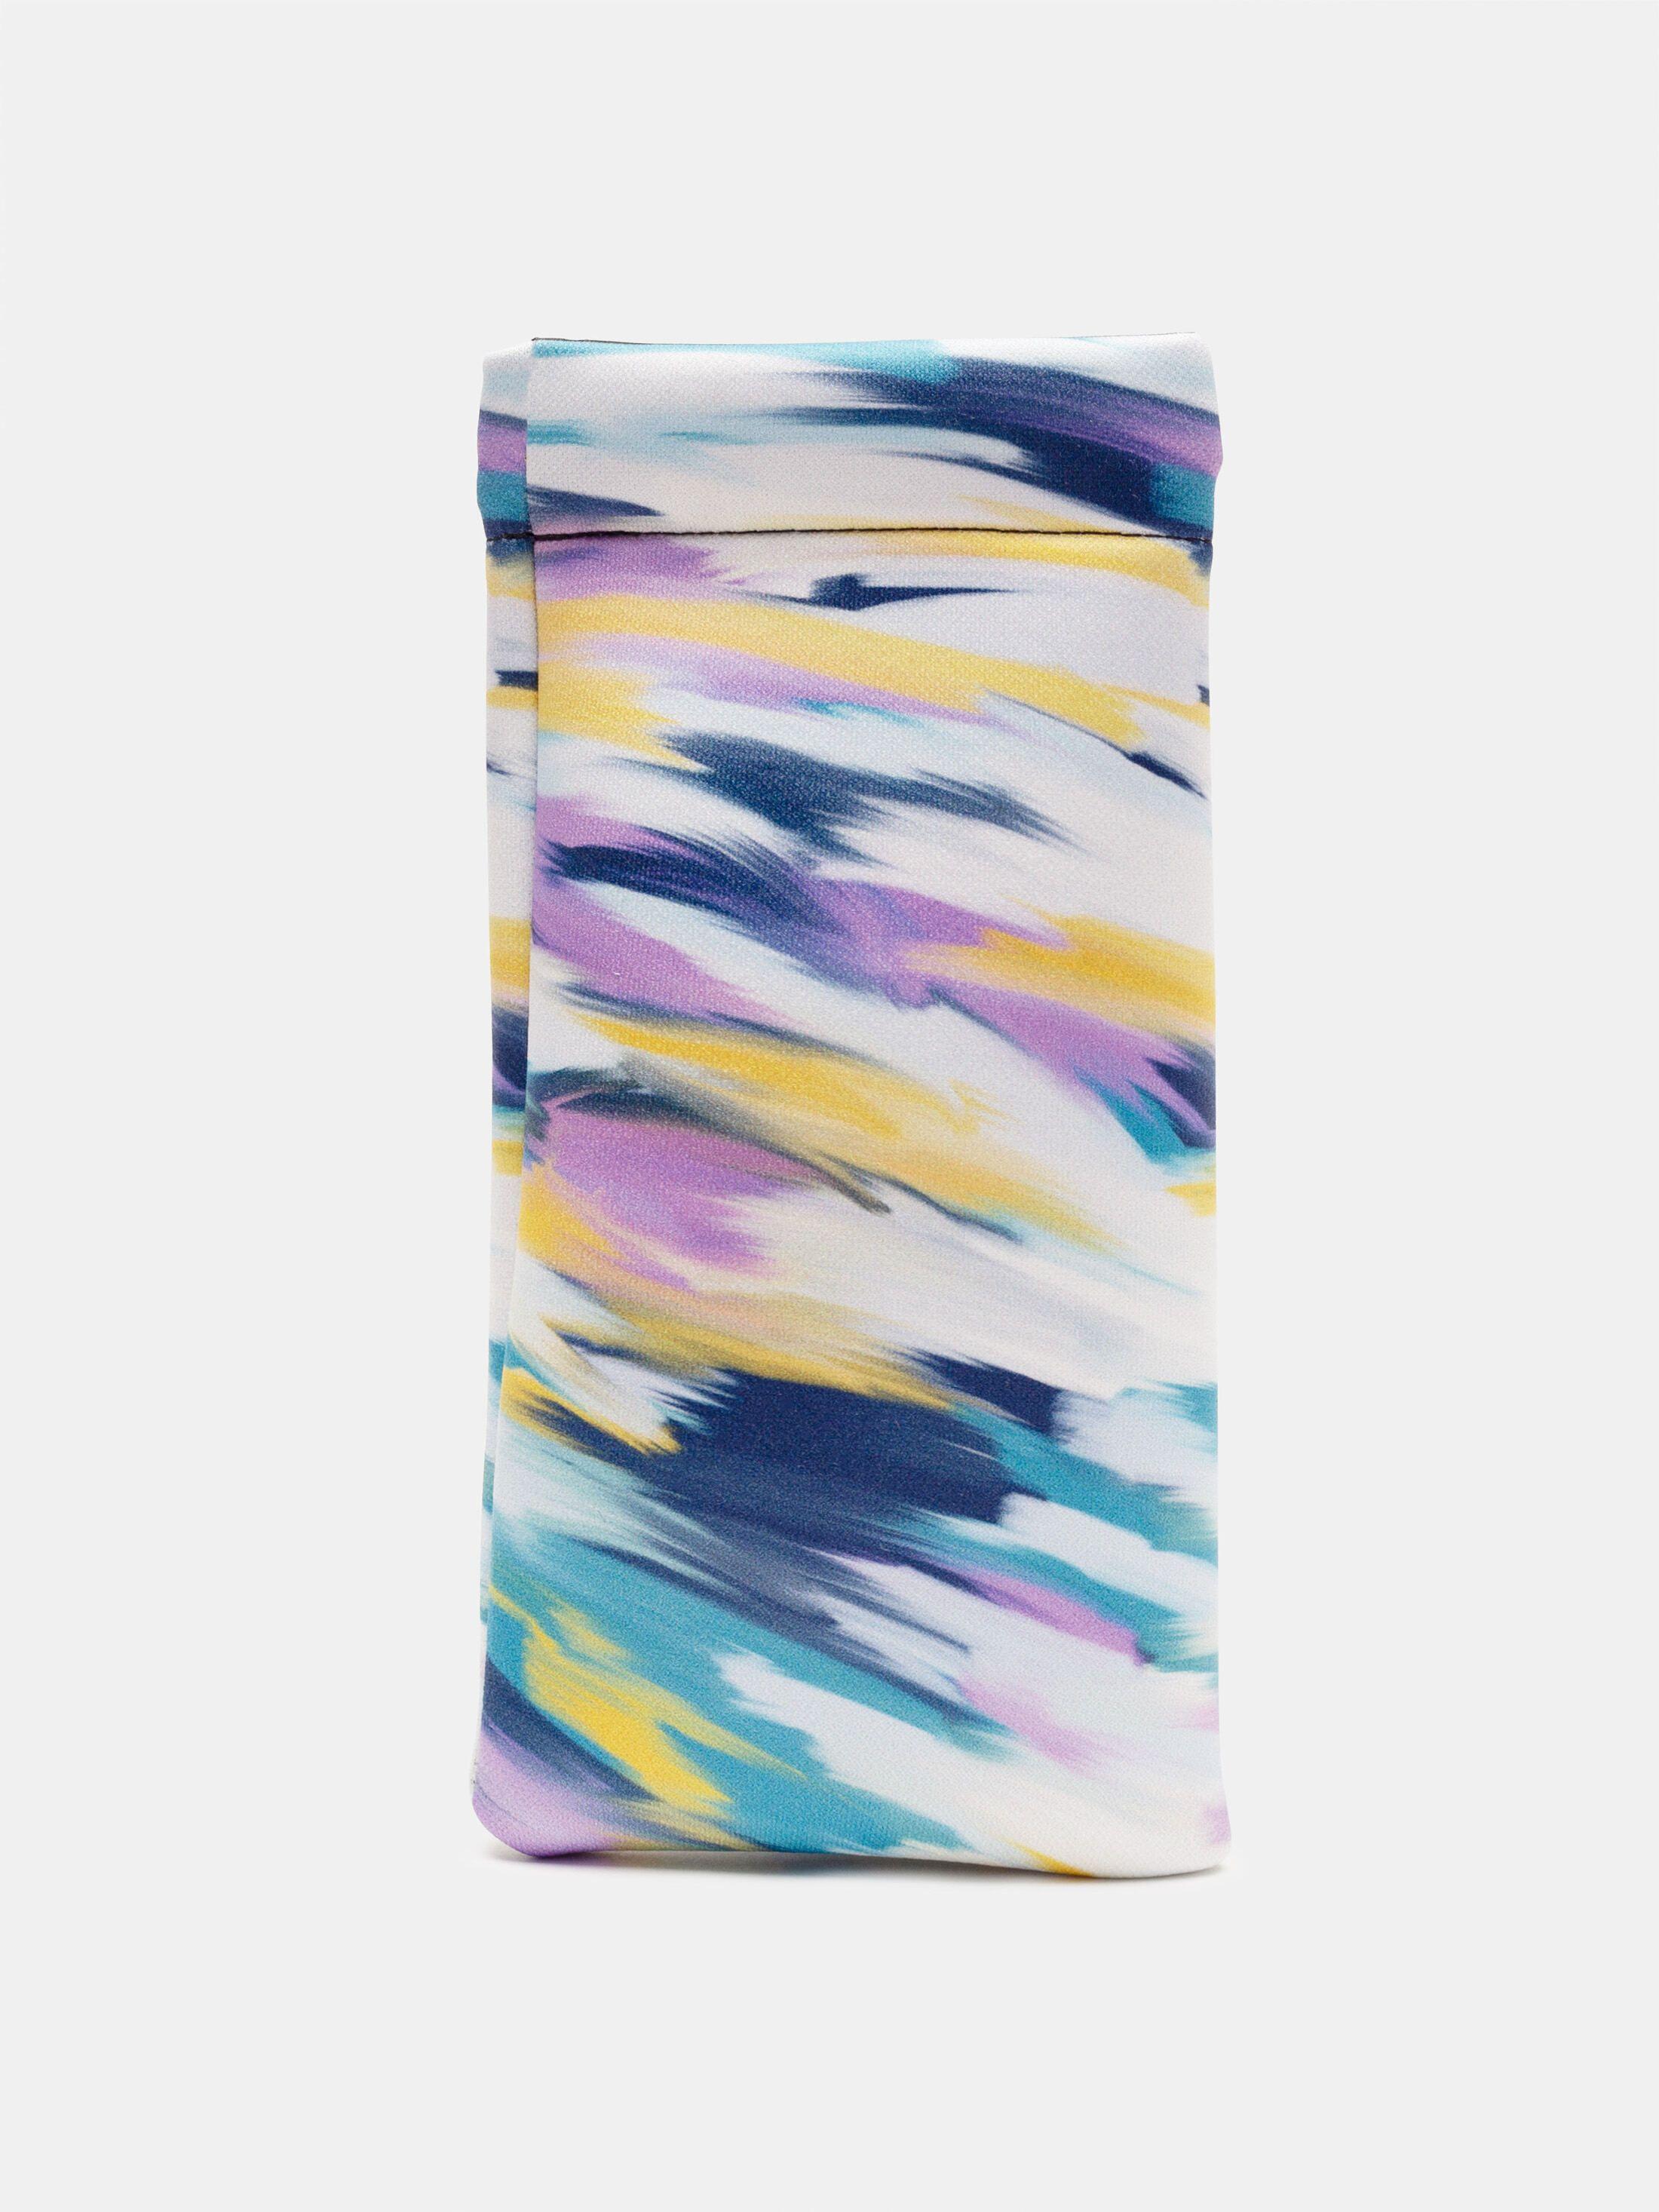 custom soft phone case